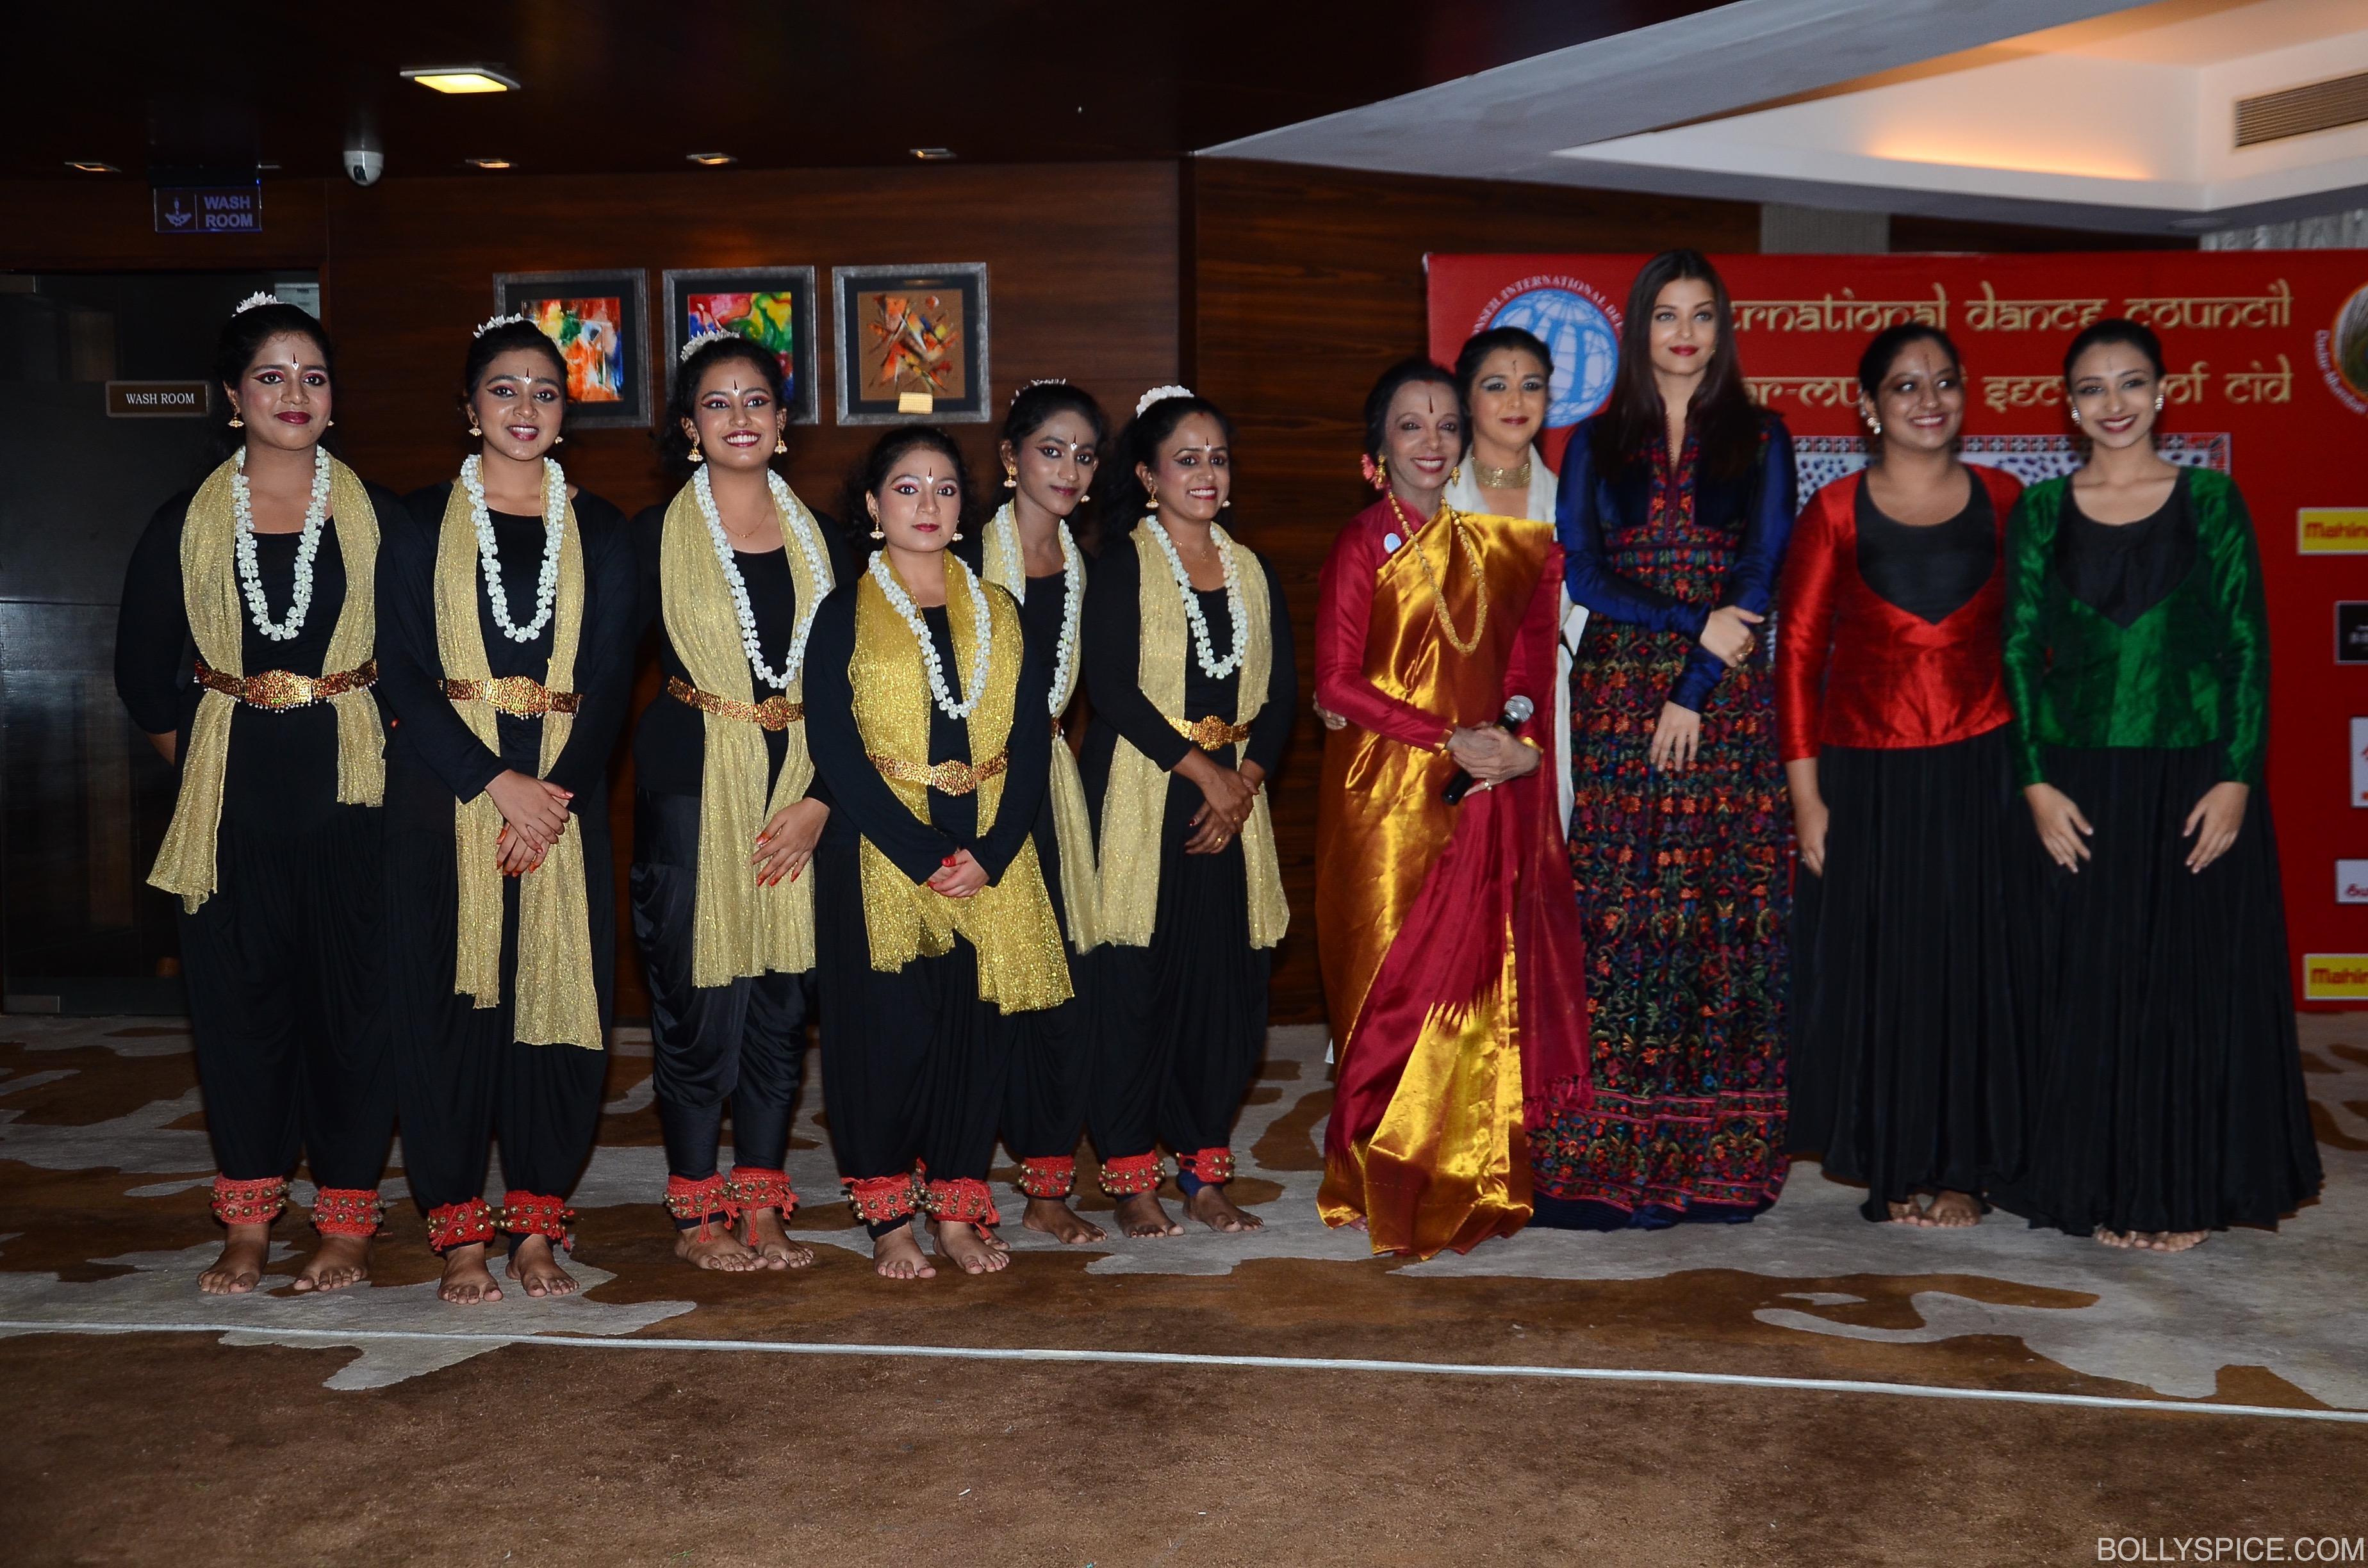 aishwarya-rai-bachchan-with-dance-perfromers